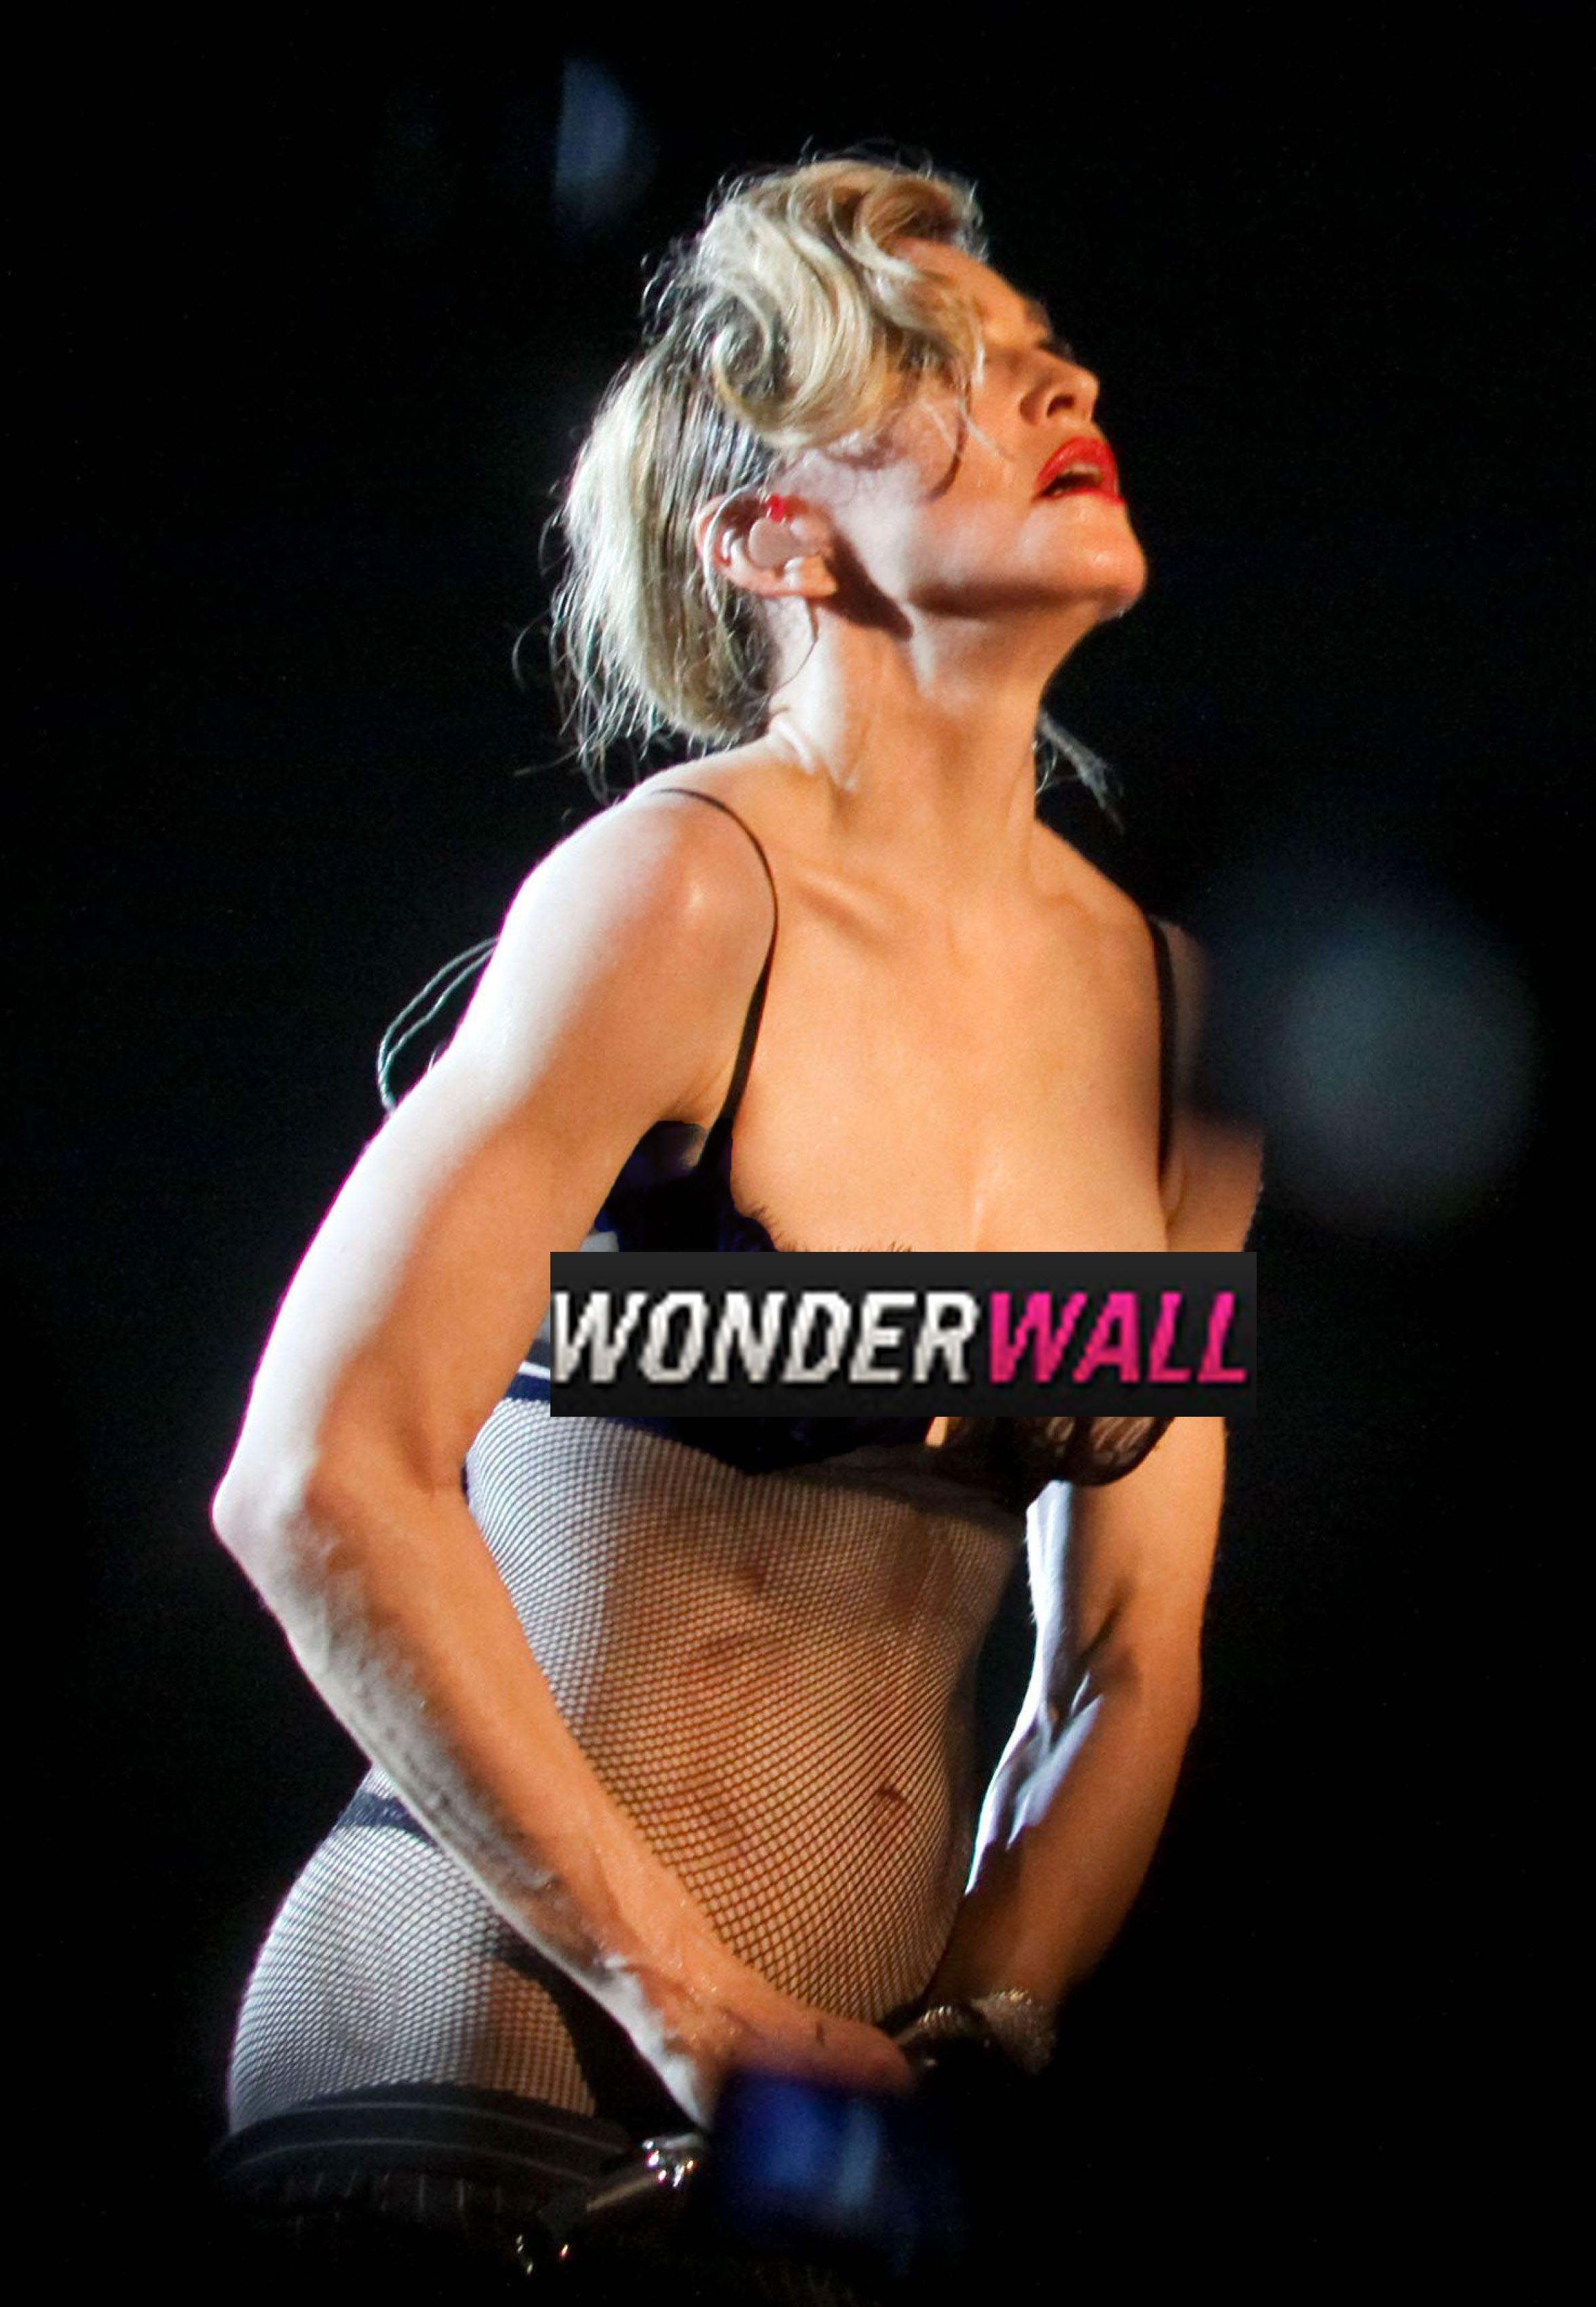 Madonna racy pics Instagram warning